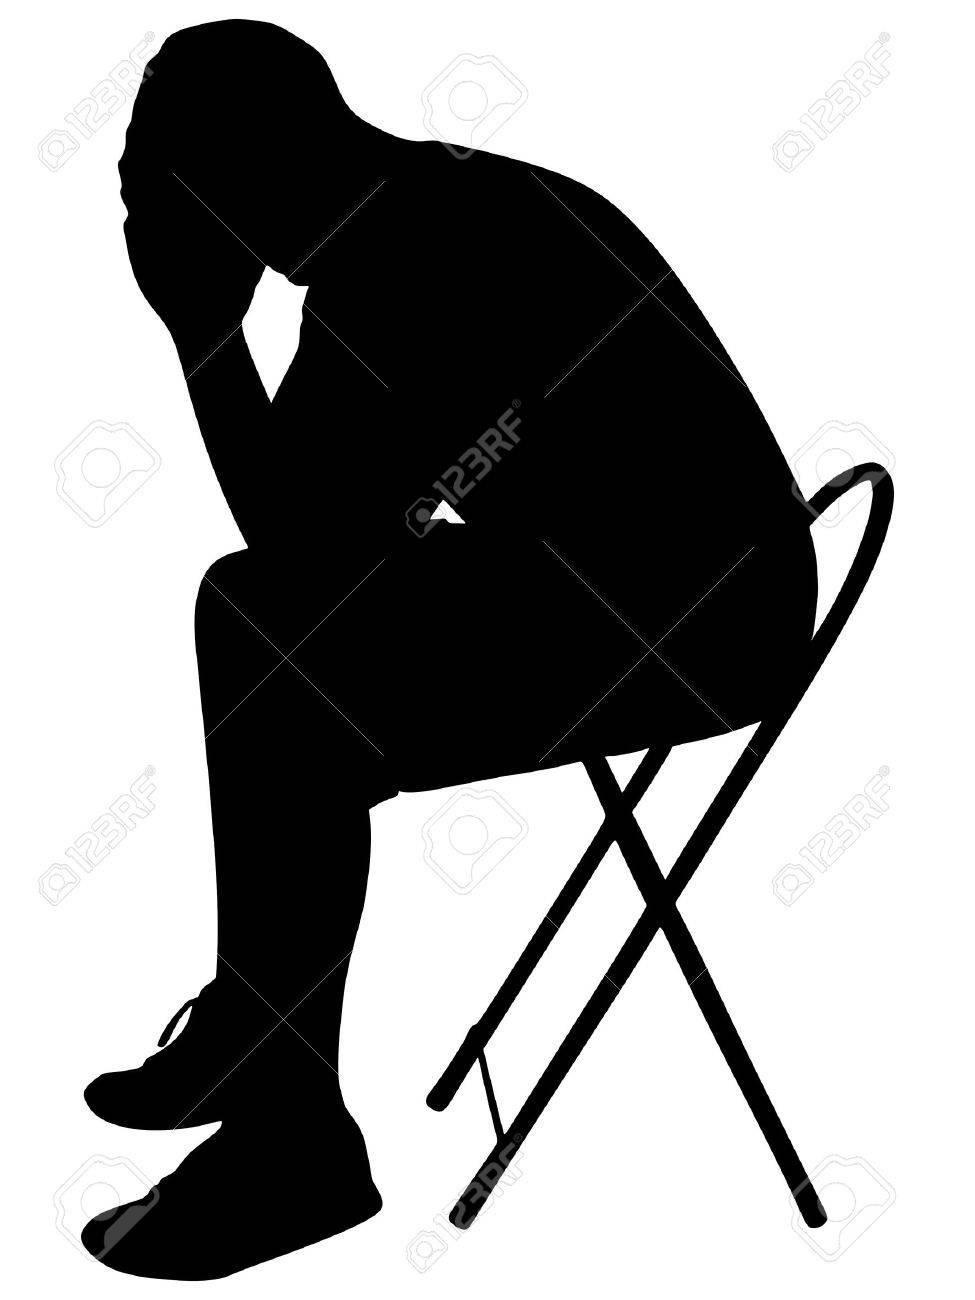 Stock Illustration - Cartoon worried man. Clipart Illustrations gg68708670  - GoGraph